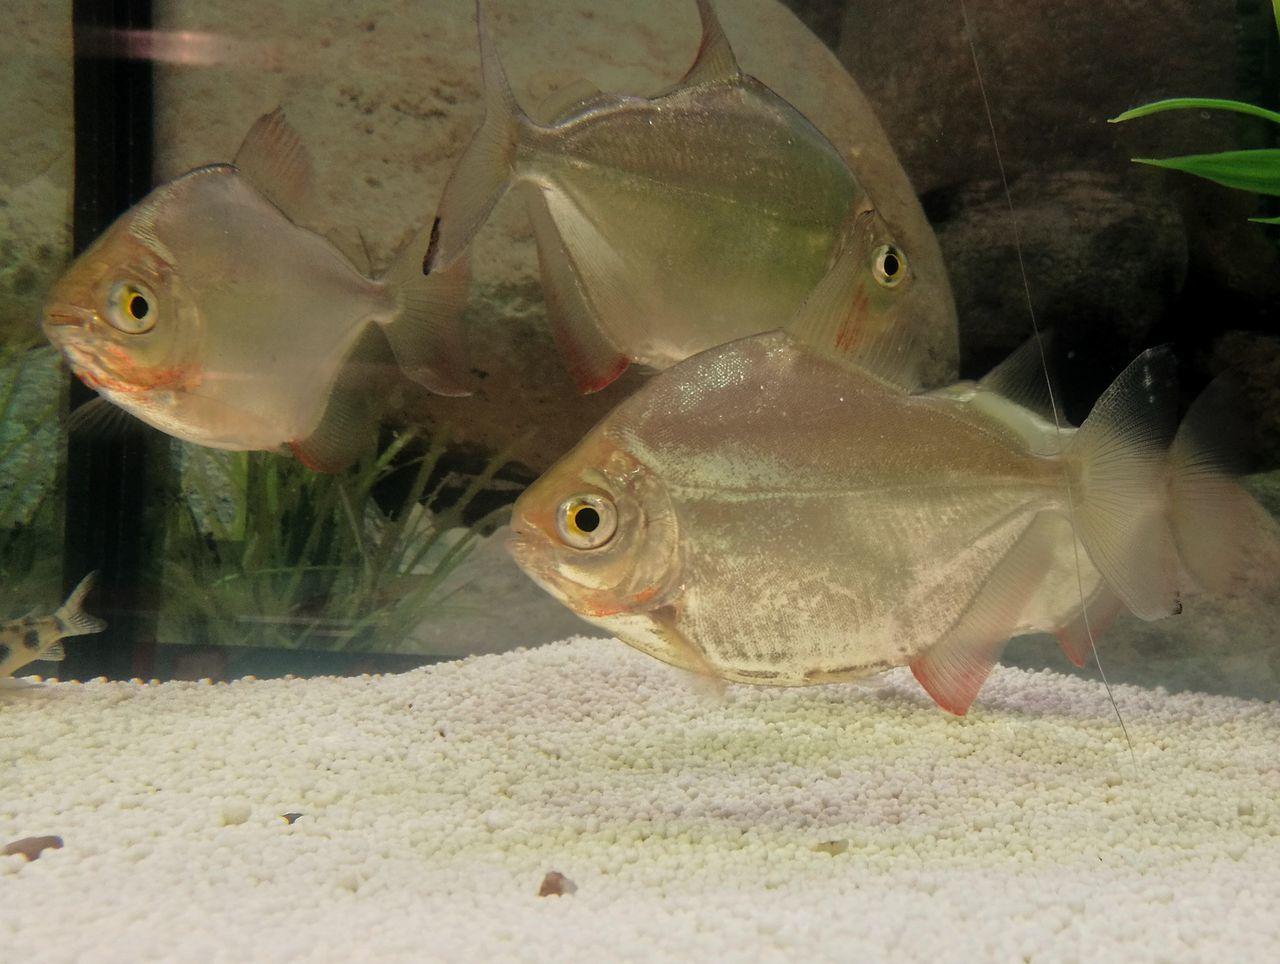 Fish Animal Themes Close-up Piranhas Aquarium Fish Tank Reflections Fish Tank Decoration Fishtank Aquarium Photography Aquarium Life Aquarium Fish Aquarium Green Decoration Underwater World No People